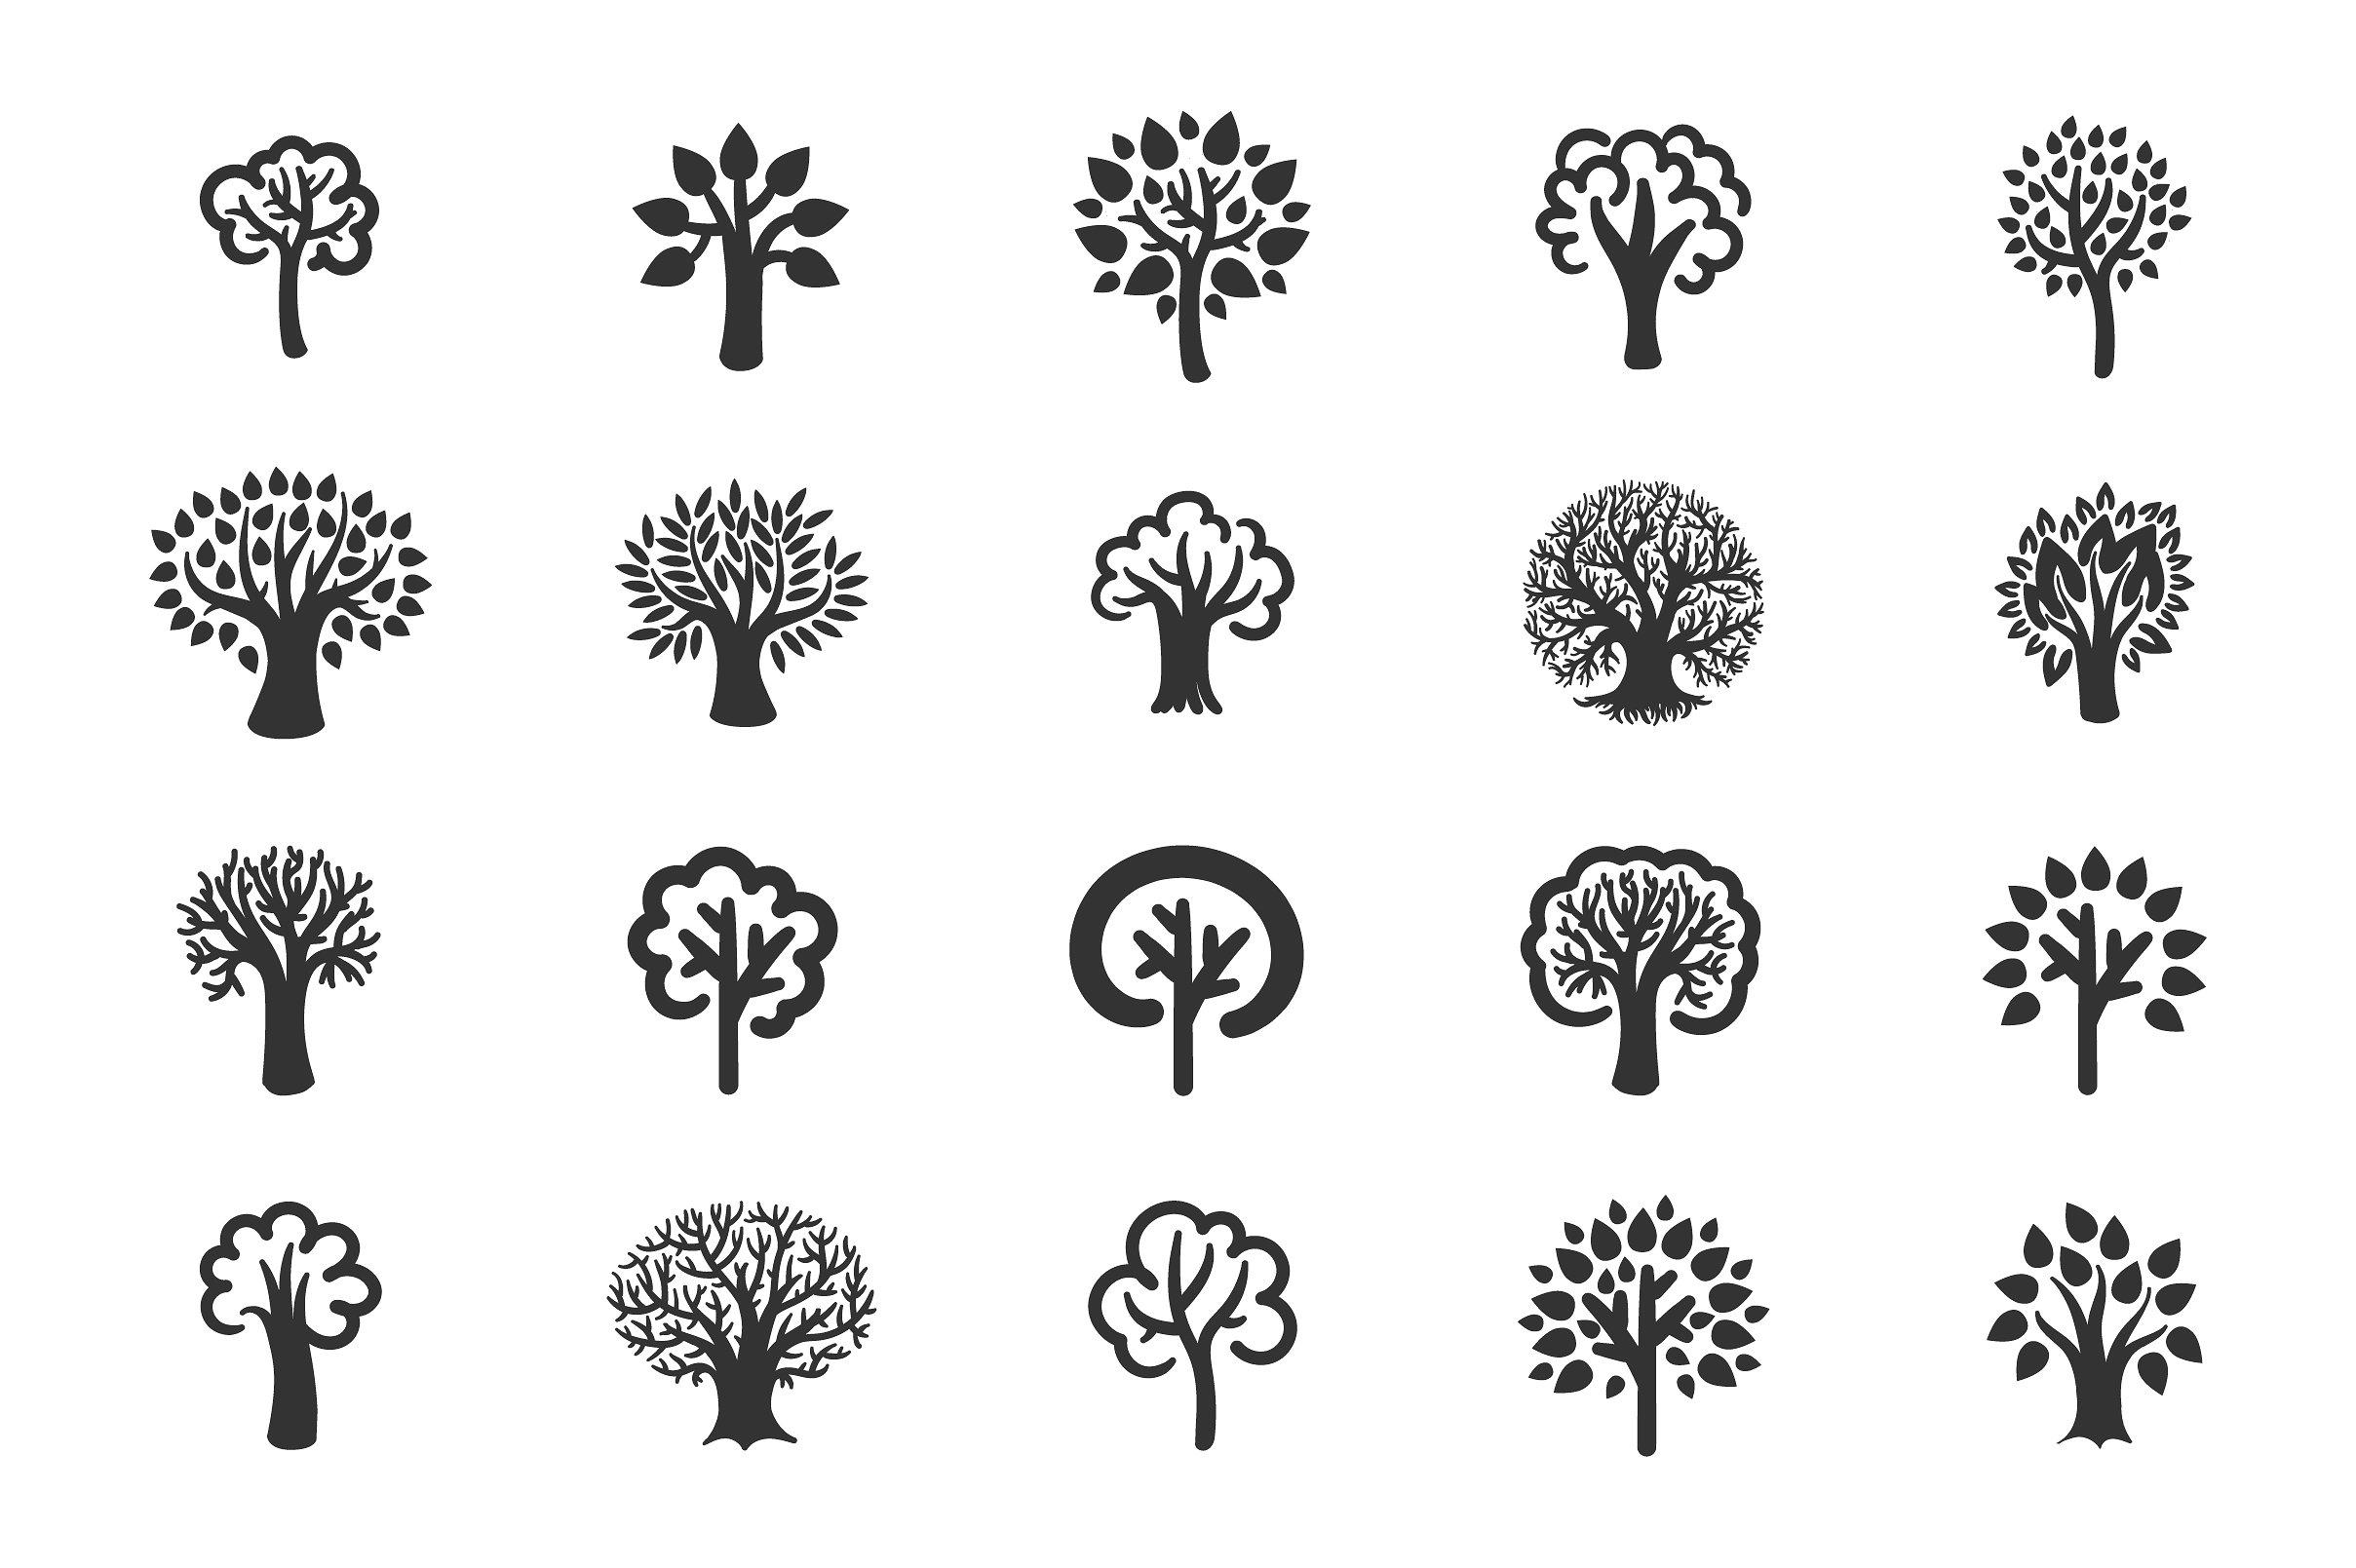 Tree icon set example image 2